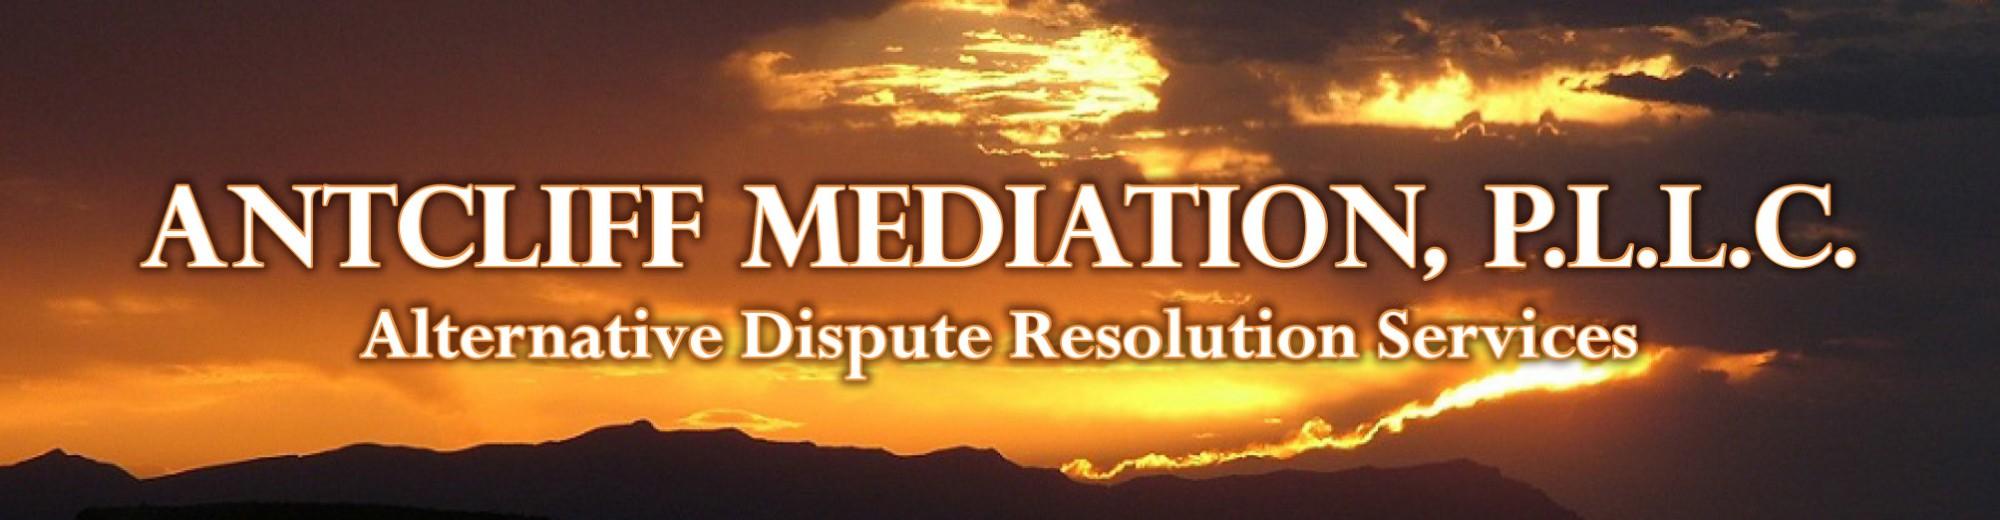 Antcliff Mediation